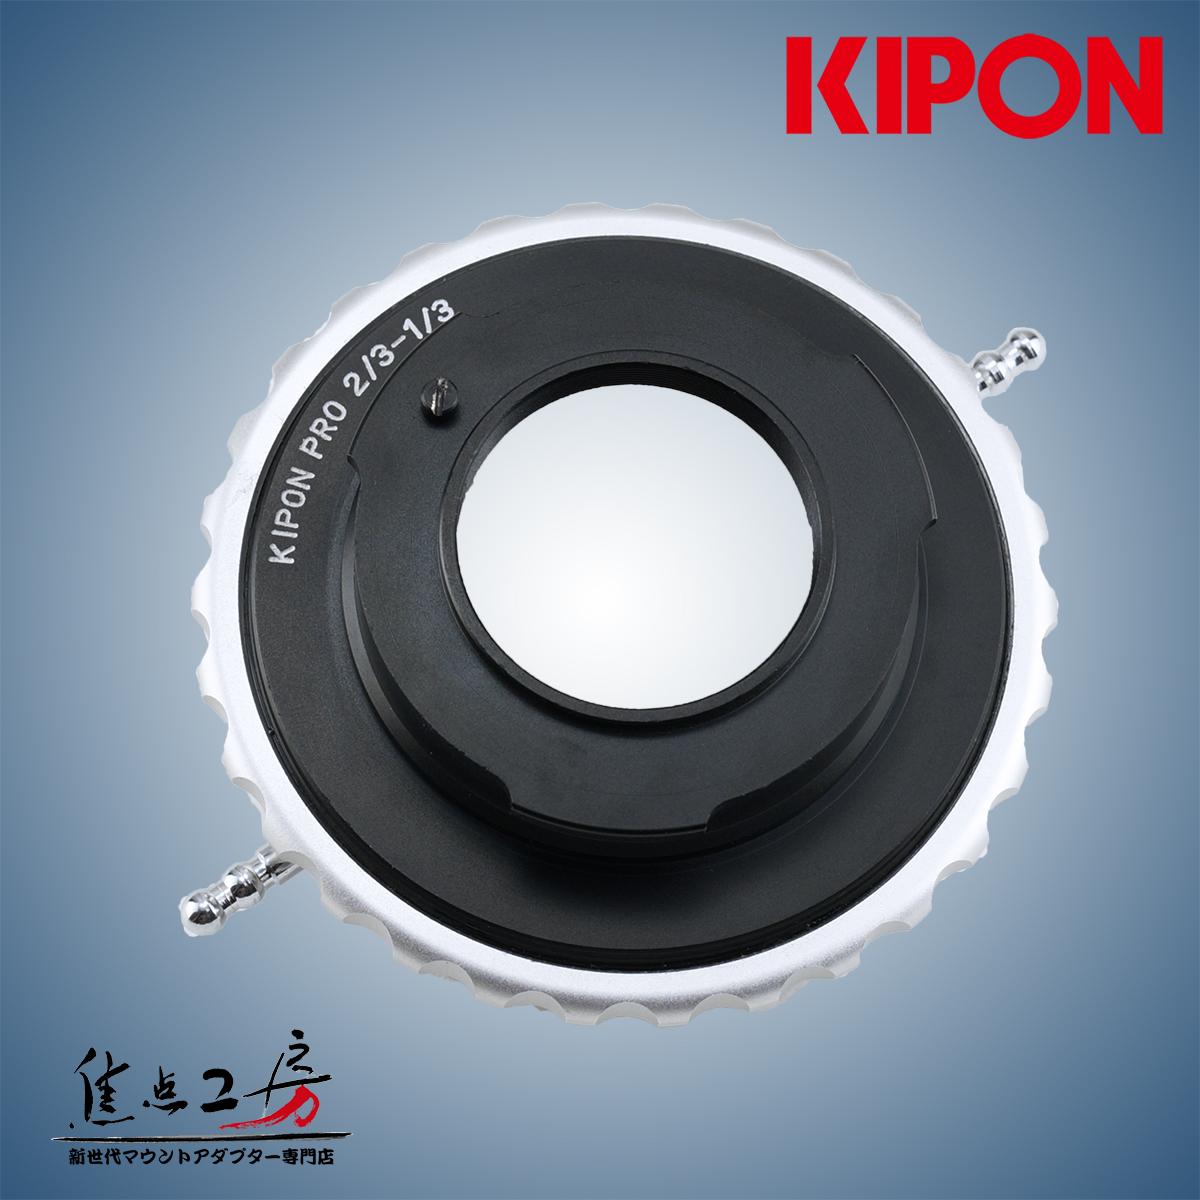 KIPON 2/3-1/3 B4・ENGマウントレンズ - ソニー1/3インチマウントアダプター